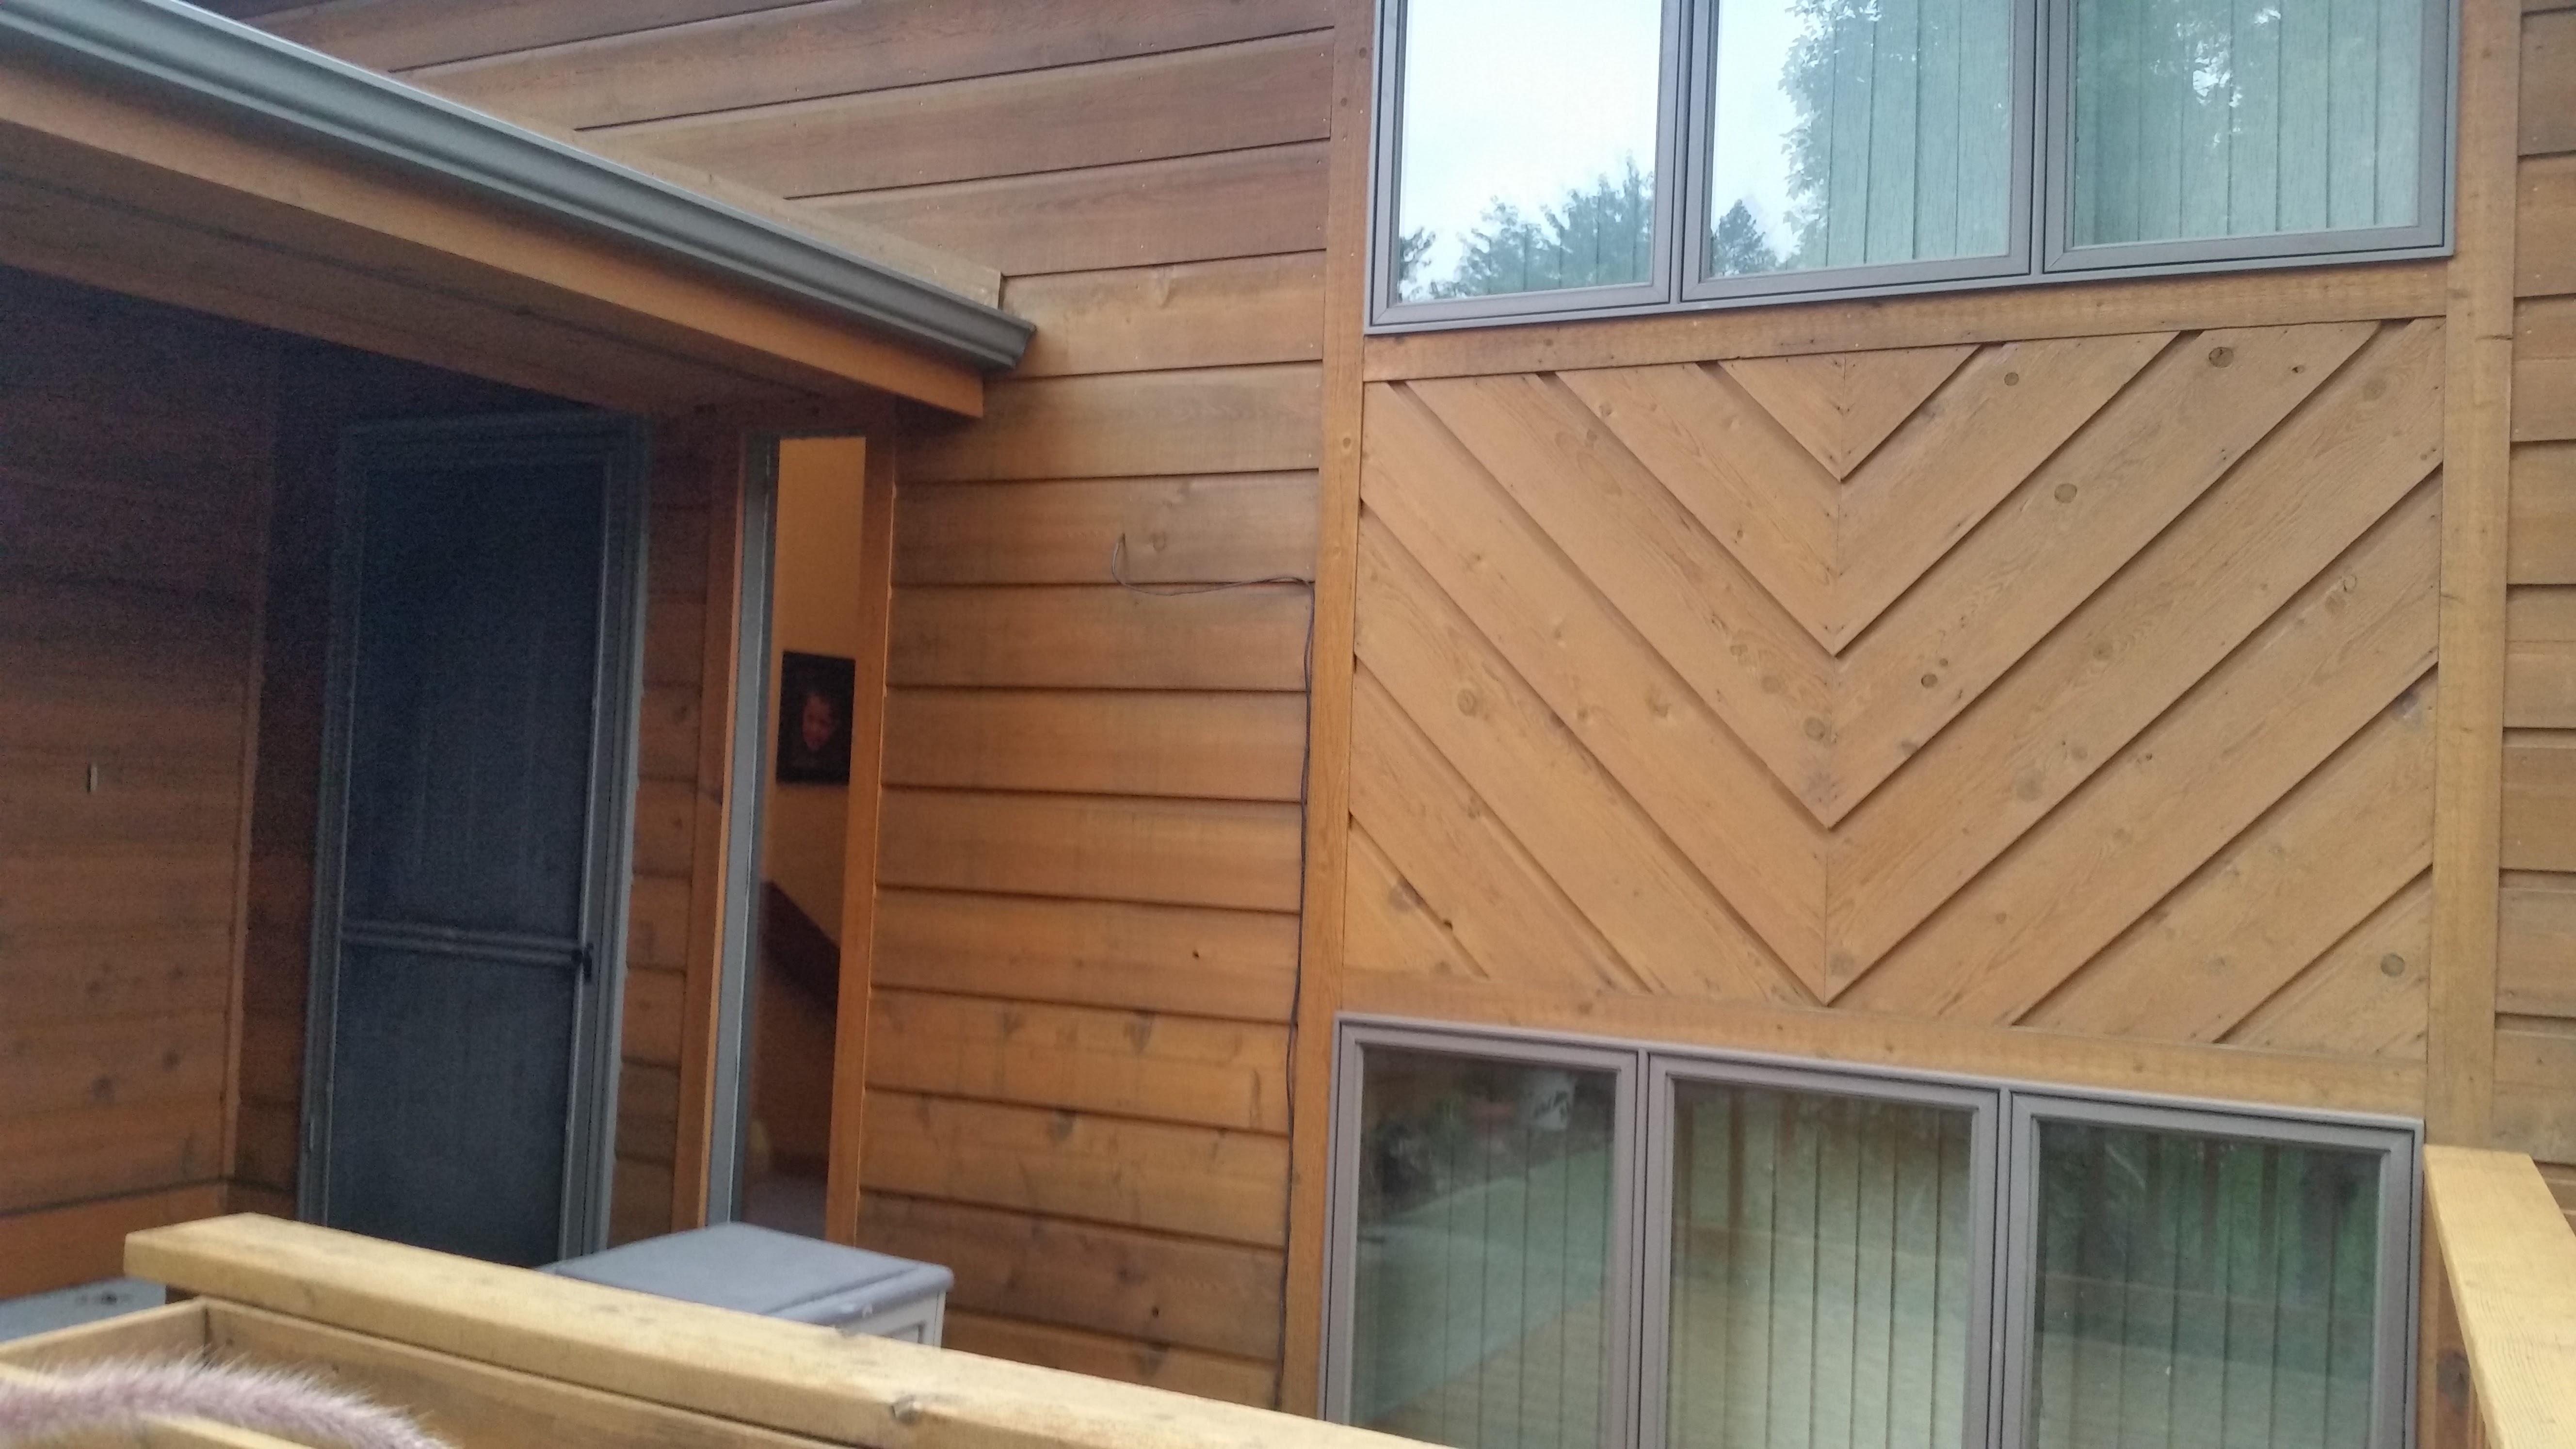 cory s painting reviews cedar falls ia angi angie s list